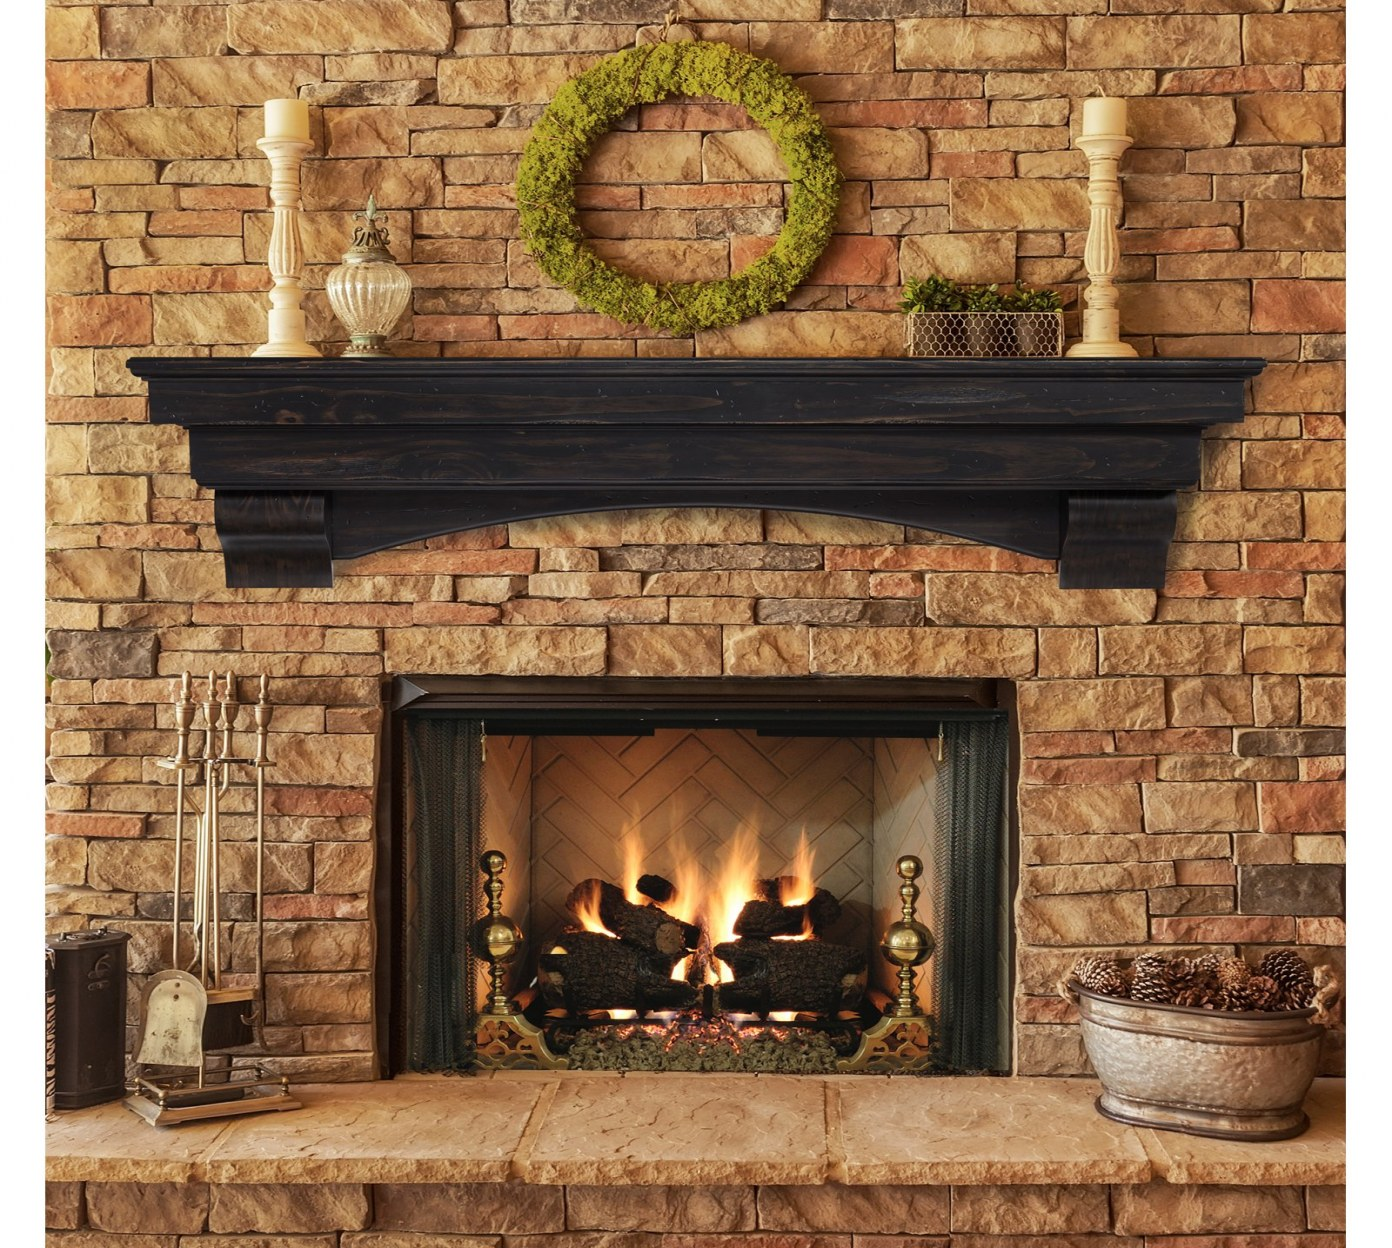 fireplace mantel shelf relatively fireplace surround with shelves ci22 roc munity of fireplace mantel shelf 2